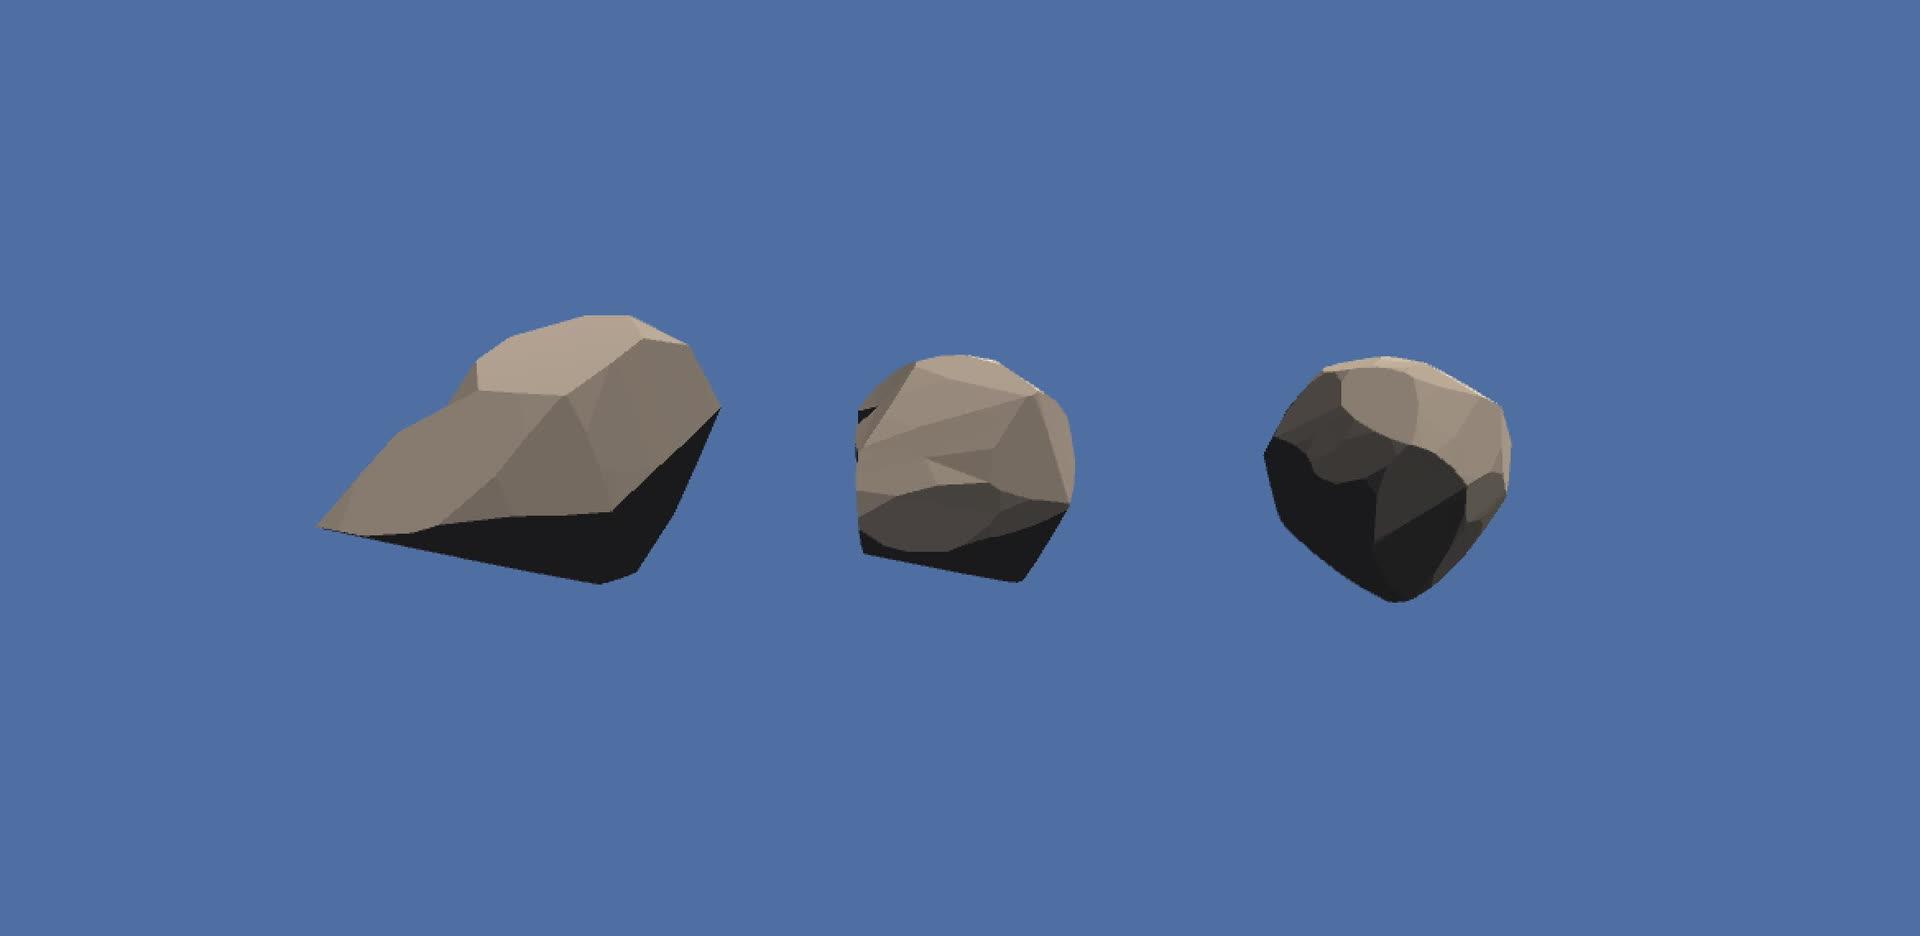 proceduralgeneration, unity3d, Better Boulders GIFs